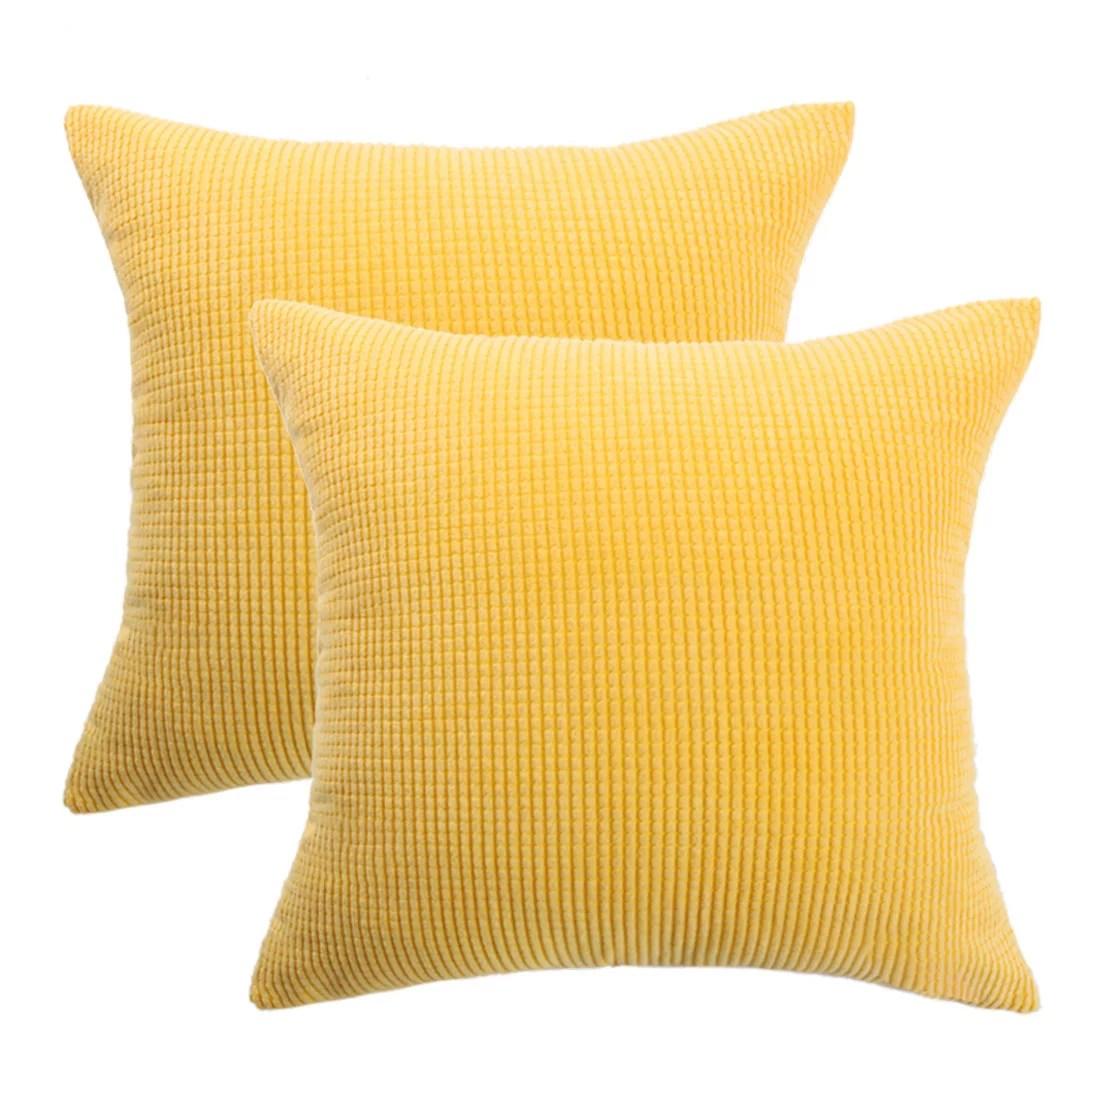 cushion covers stripe decoration throw pillow case 26 x 26 inch dark yellow 2pcs